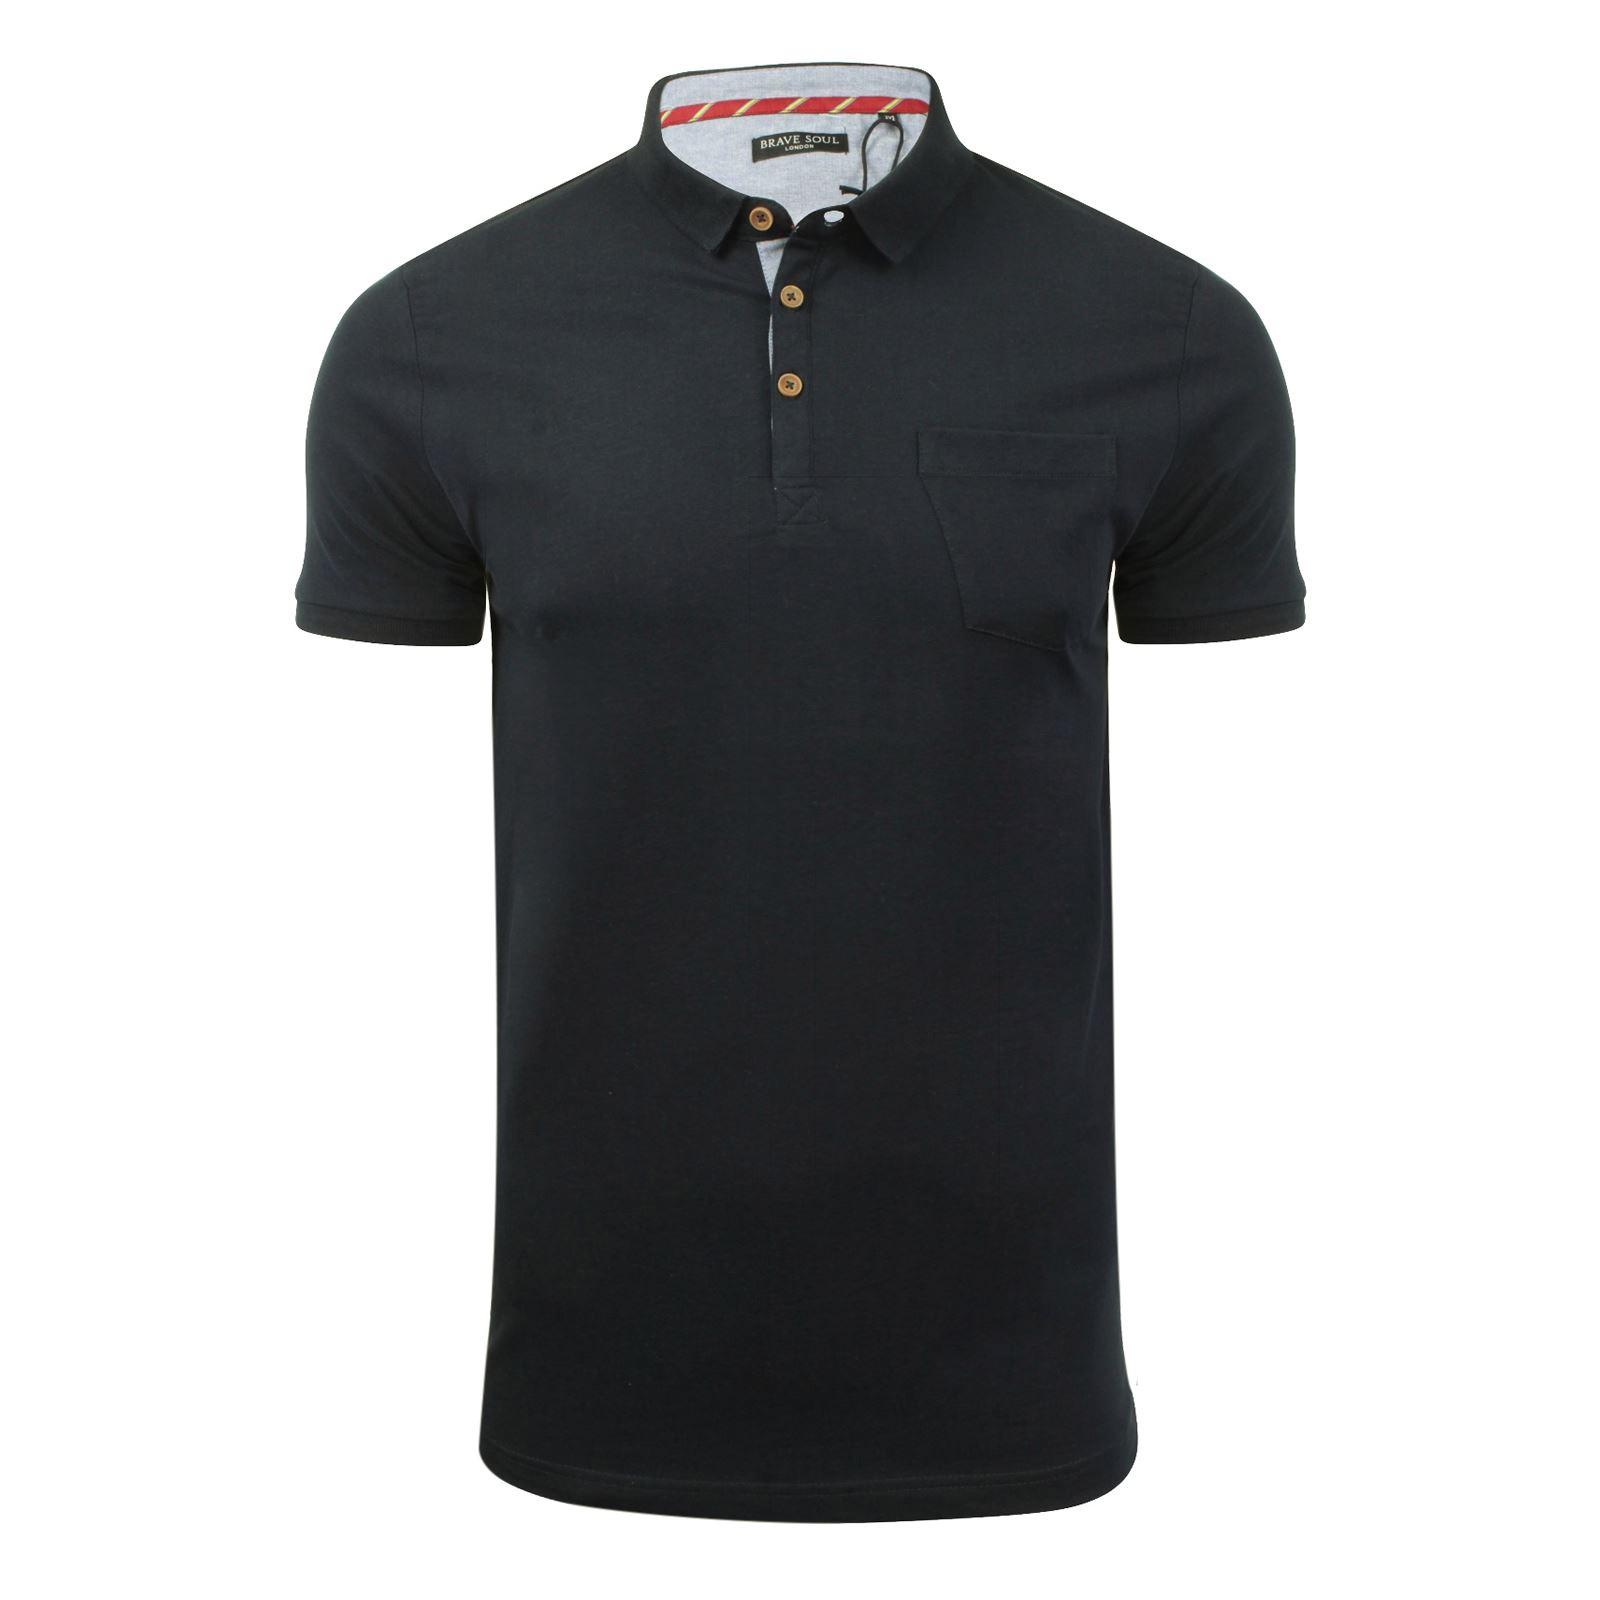 Para-Hombre-Polo-T-Shirt-Alma-valiente-Glover-Algodon-Con-Cuello-Y-Manga-Corta-Casual-Top miniatura 78